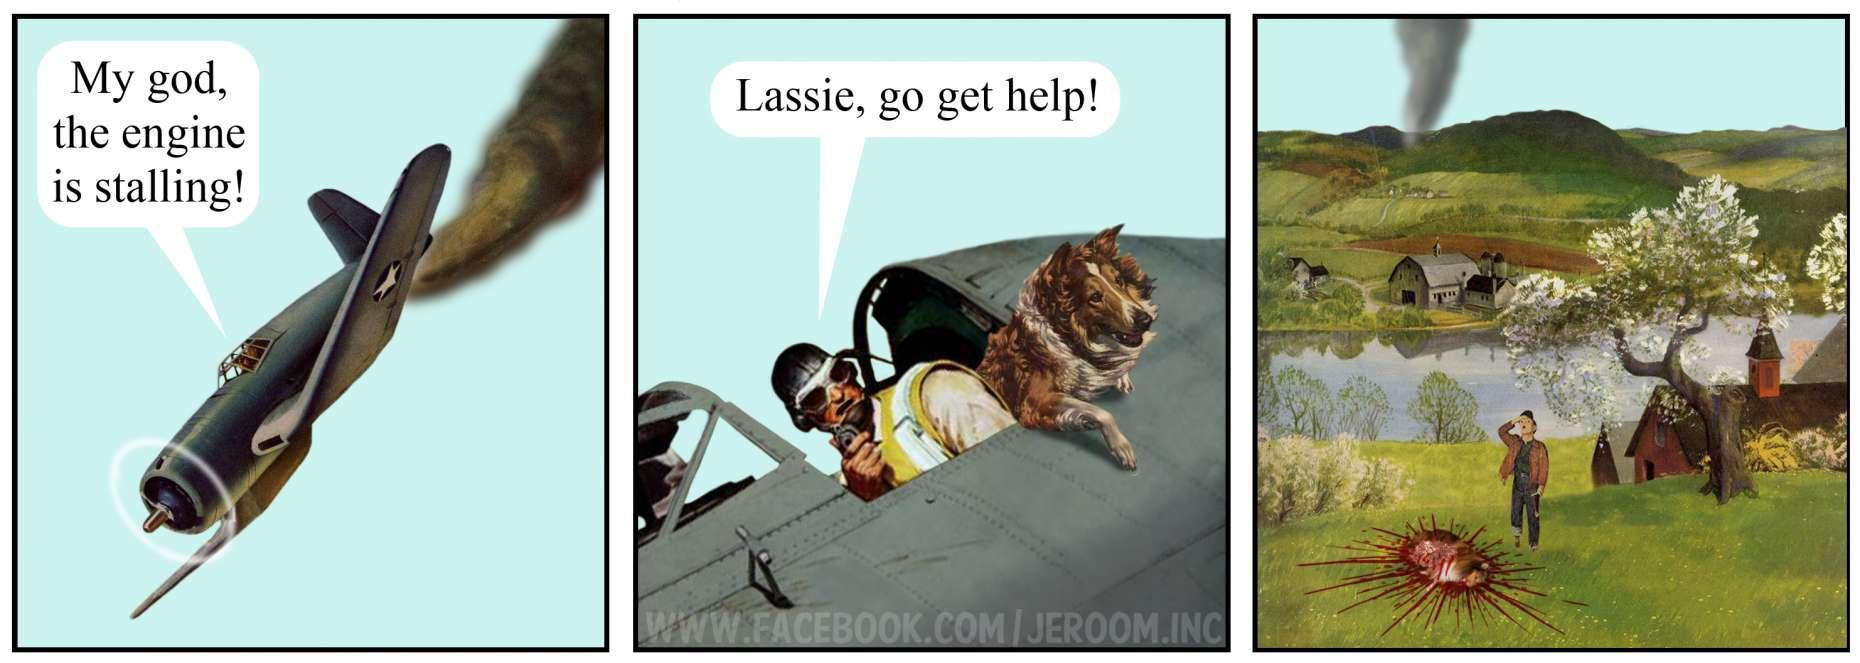 https://www.jeroom-inc.com/sites/default/files/styles/comic_full/public/2016-11/Lassie-plane.jpg?itok=6ENOBgY-